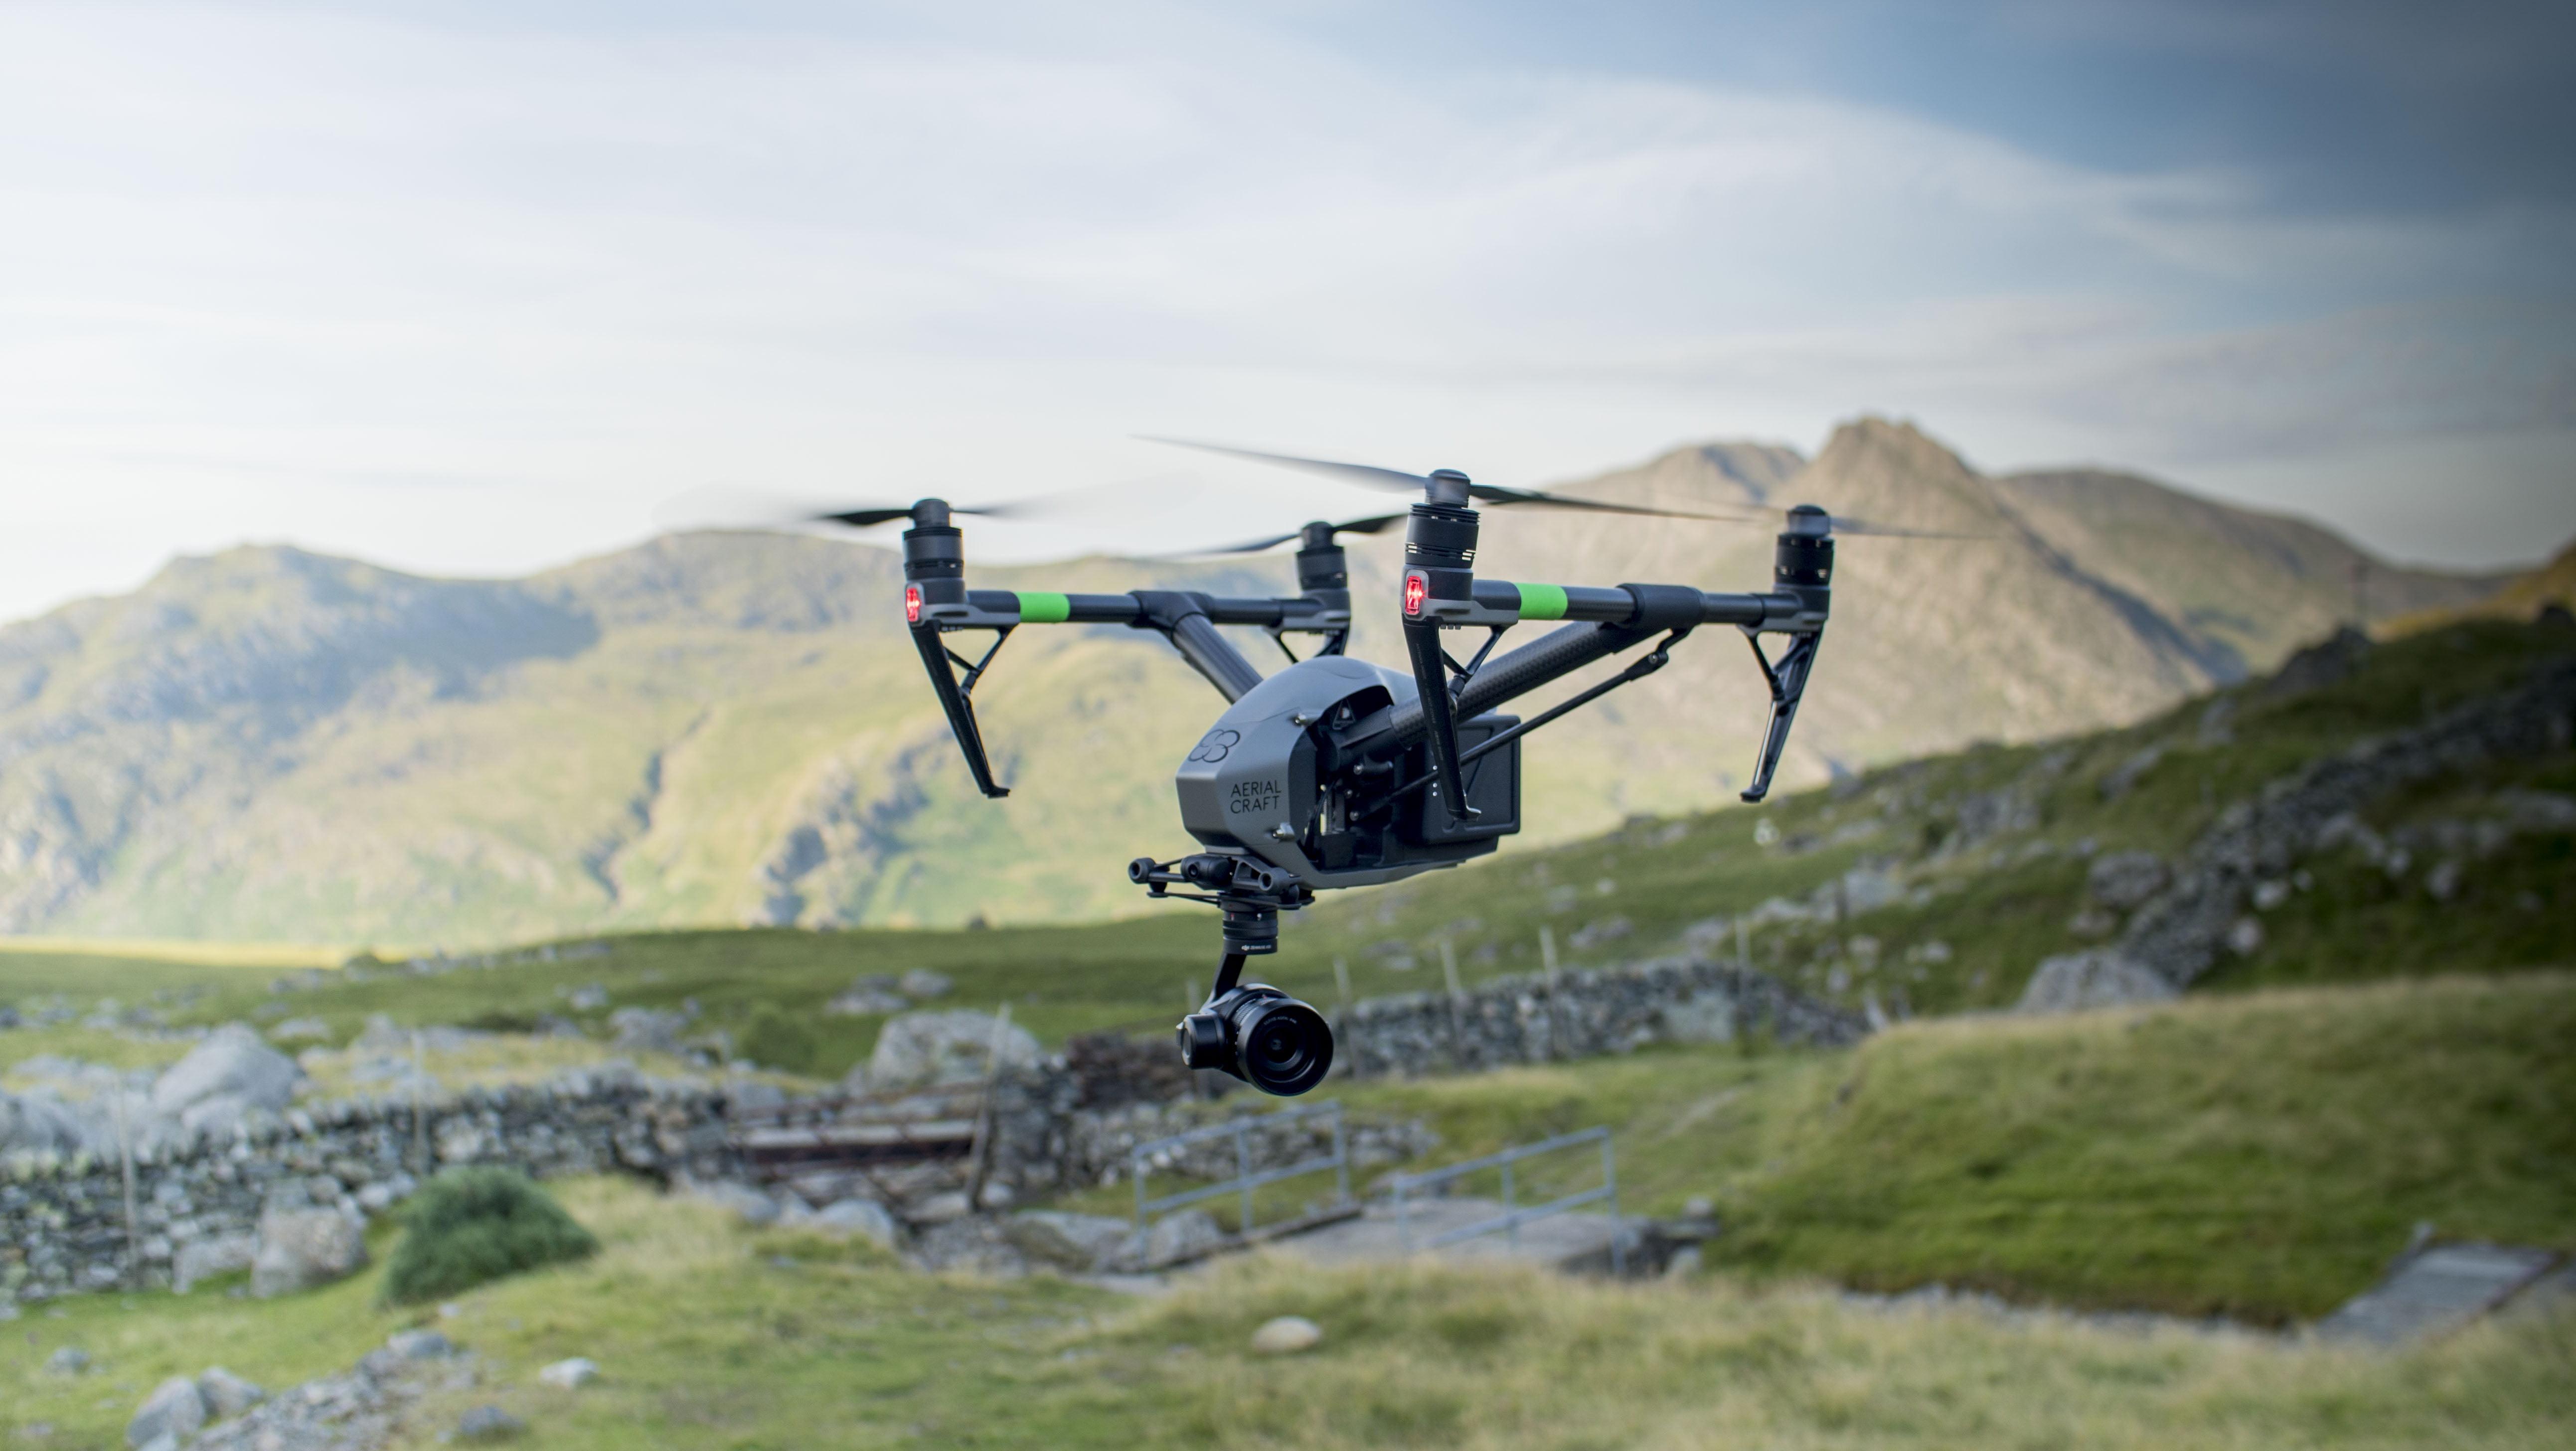 Aerial Craft | Equipment | DJ Inspire 2 Drone in Flight